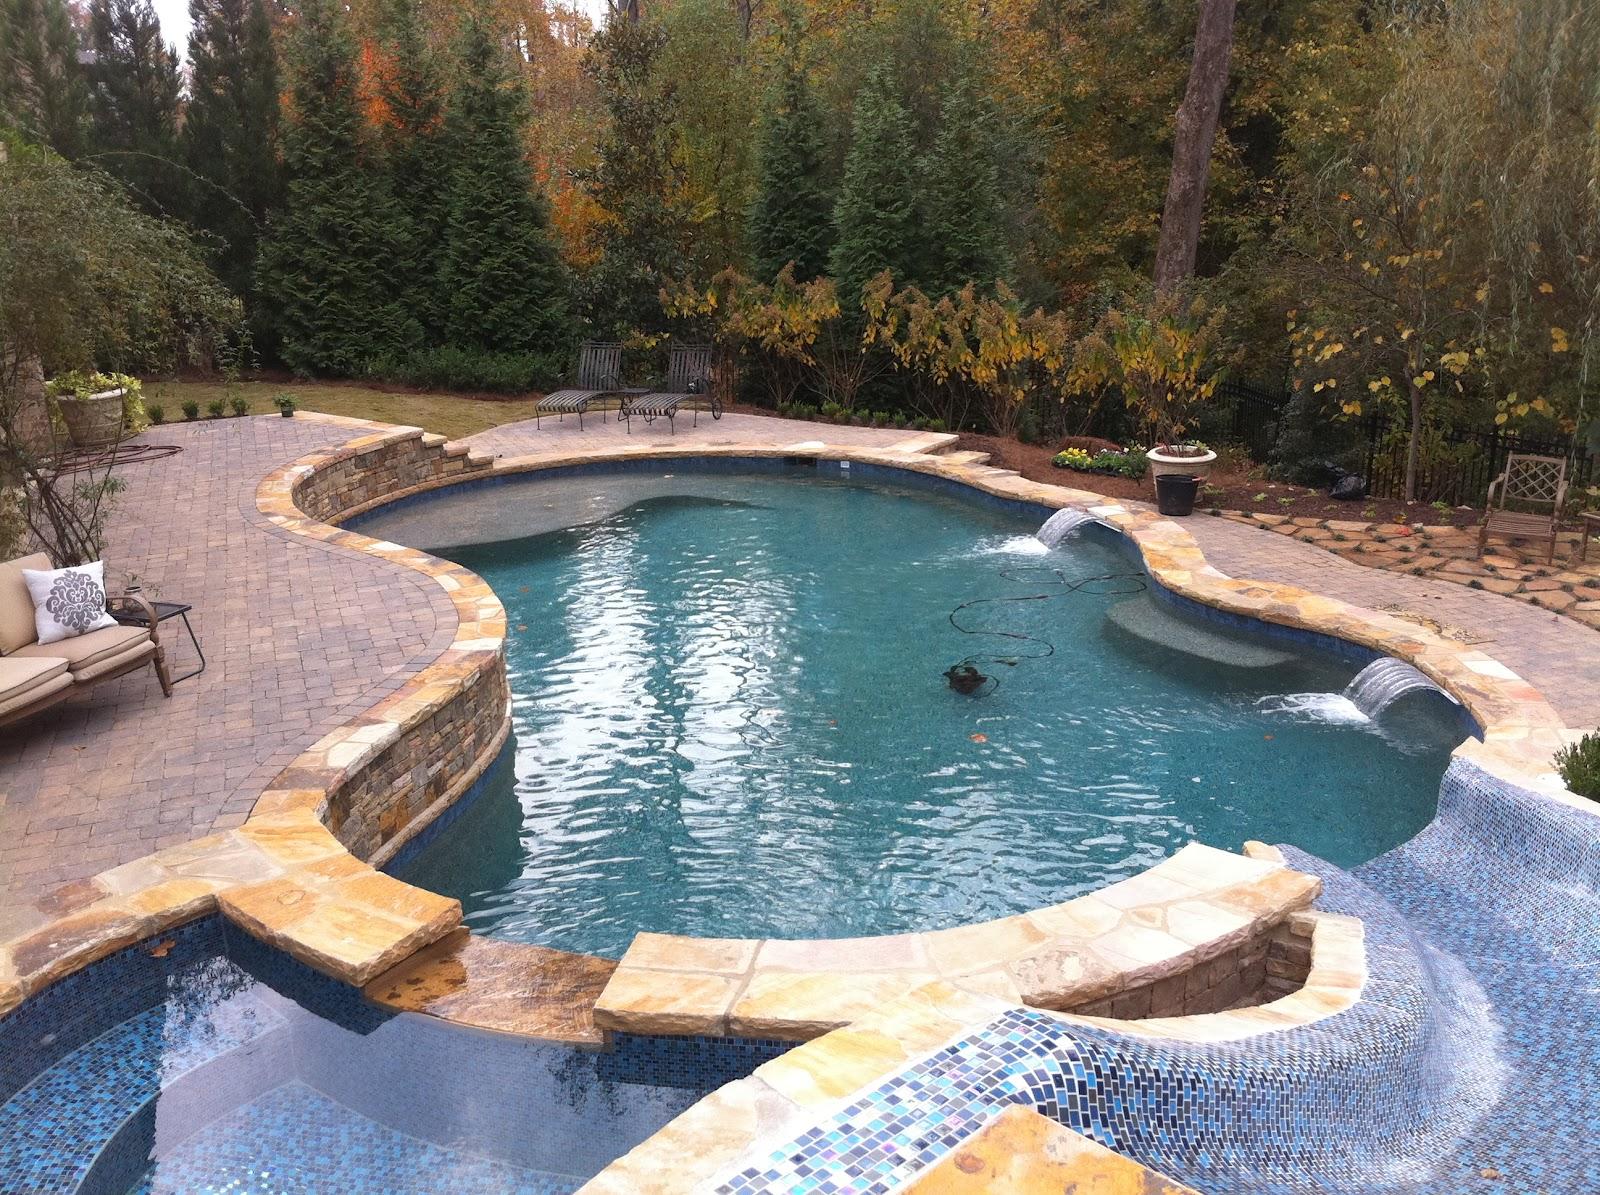 backyard oasis pools free form pool st marlo. Black Bedroom Furniture Sets. Home Design Ideas